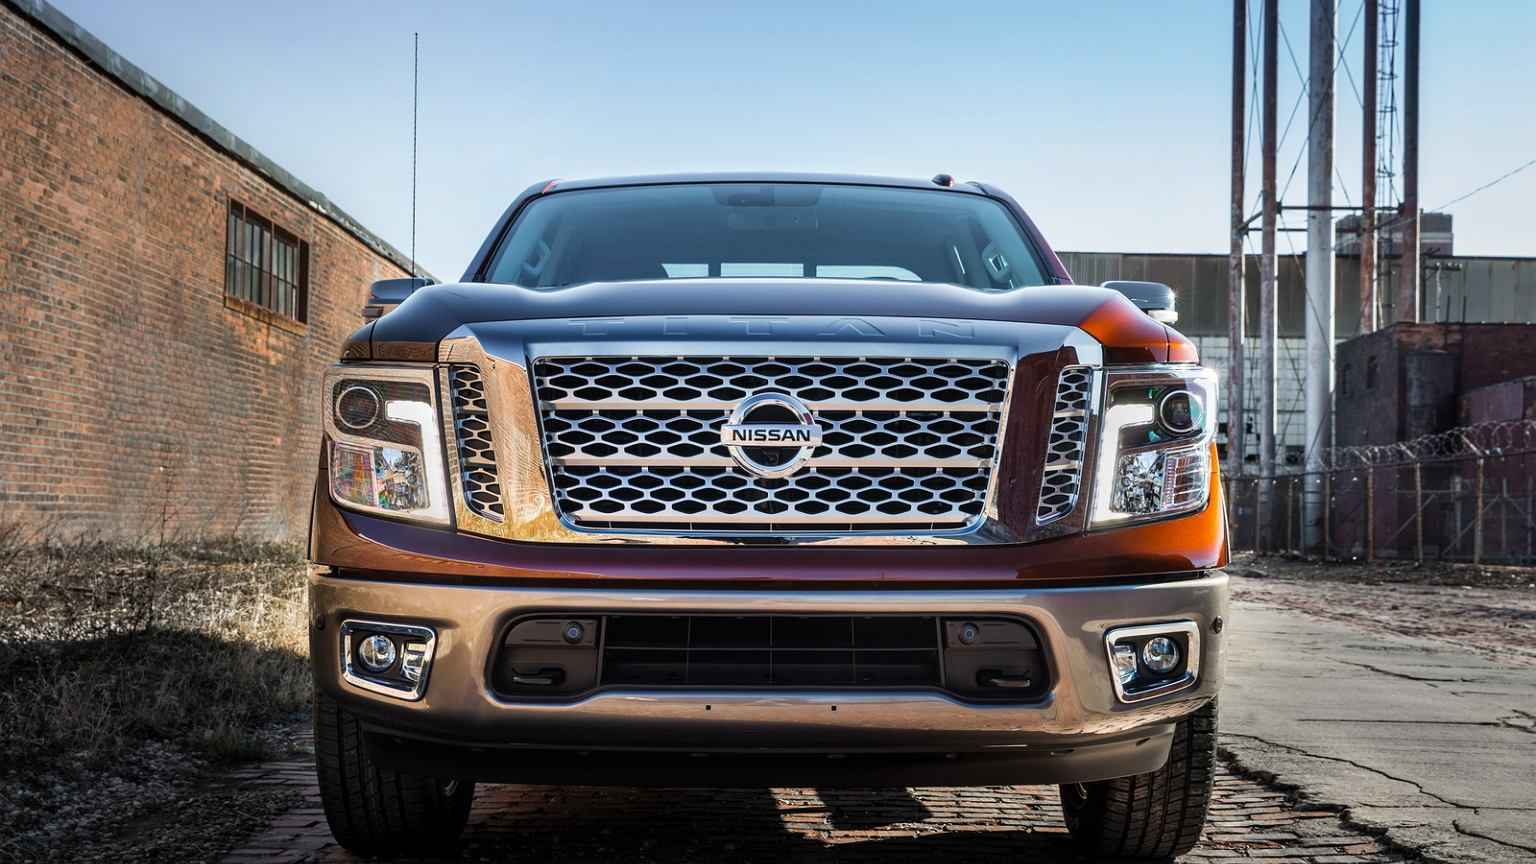 salon nowy jork 2016 nissan titan xd pickup z potężn�